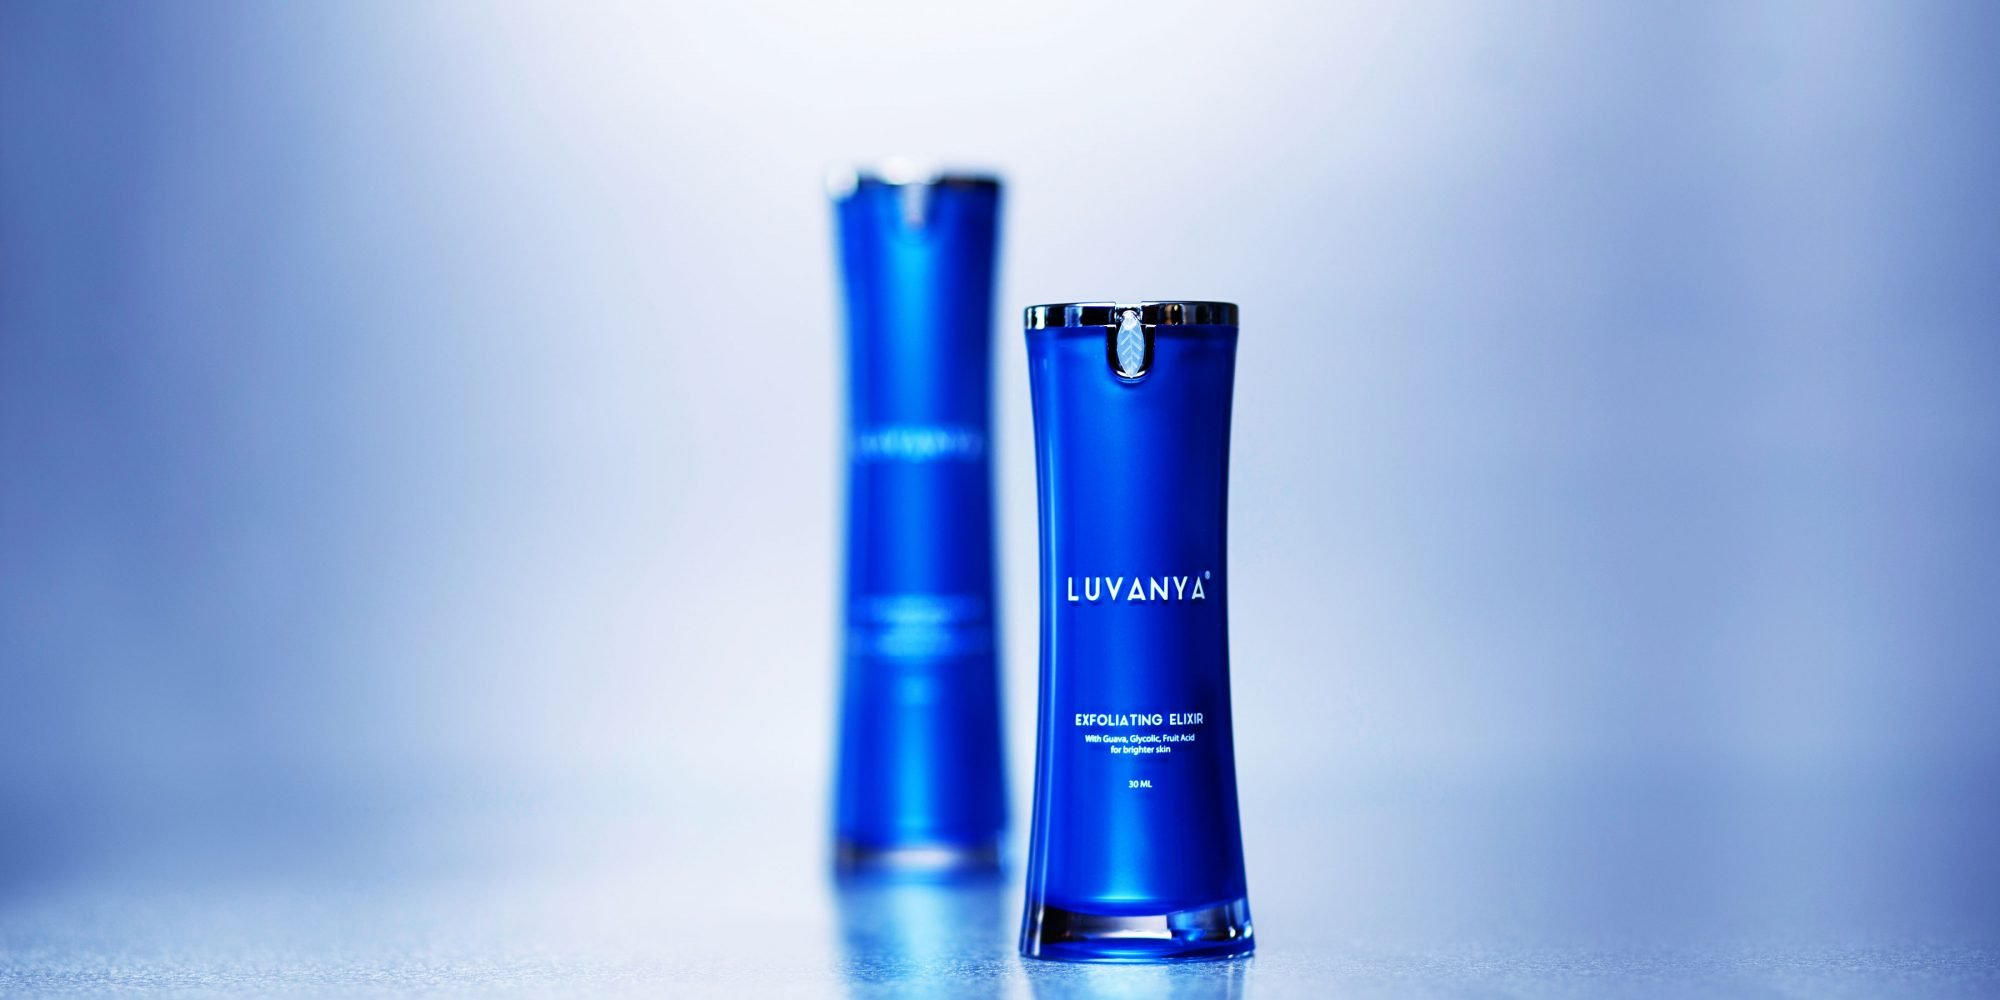 New Brand Luvanya's Prescription Is Safe Skincare